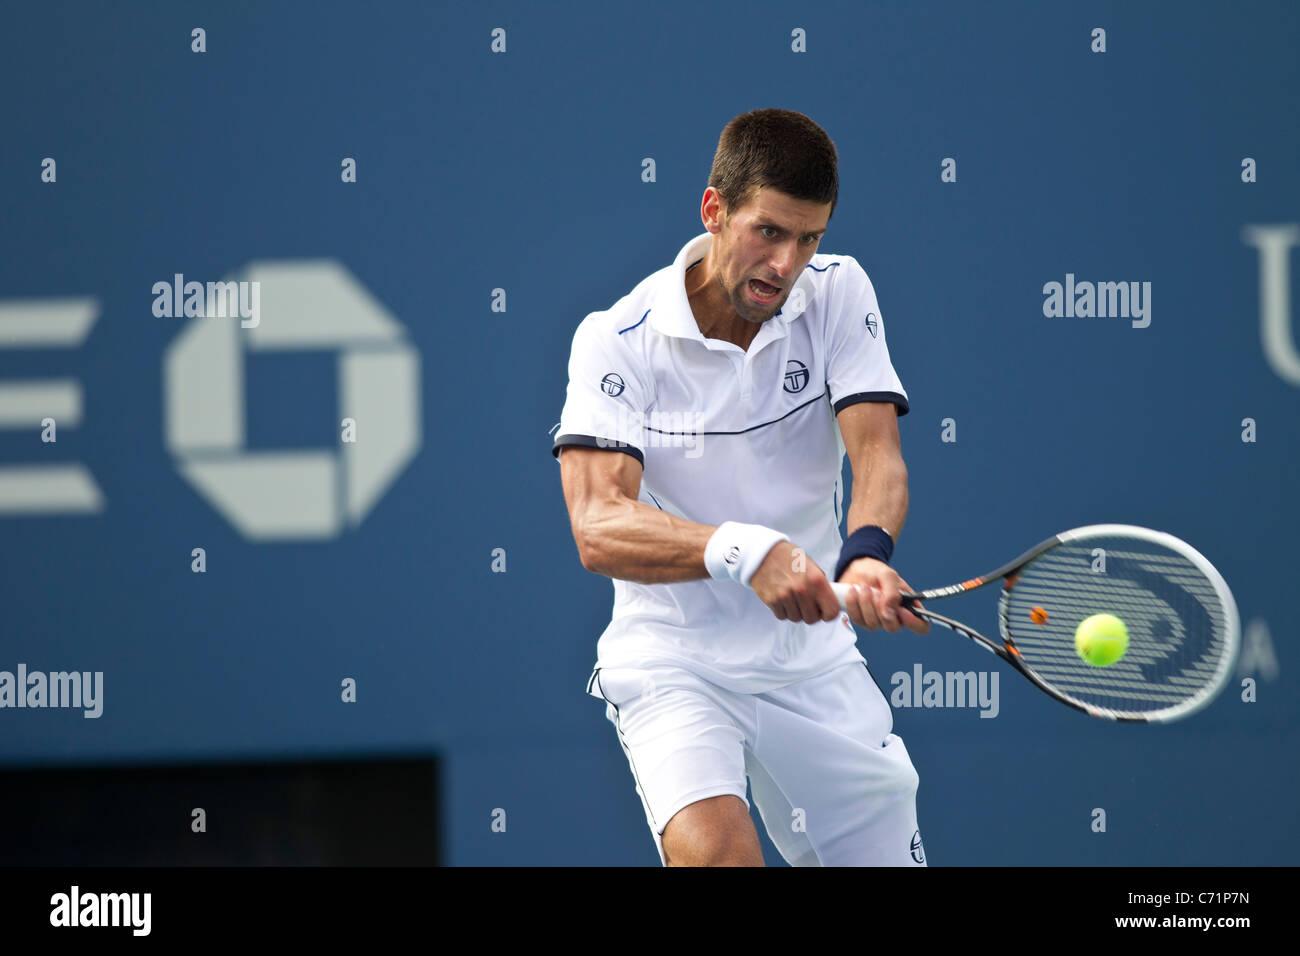 Novak Djokovic (SRB) competing at the 2011 US Open Tennis. - Stock Image